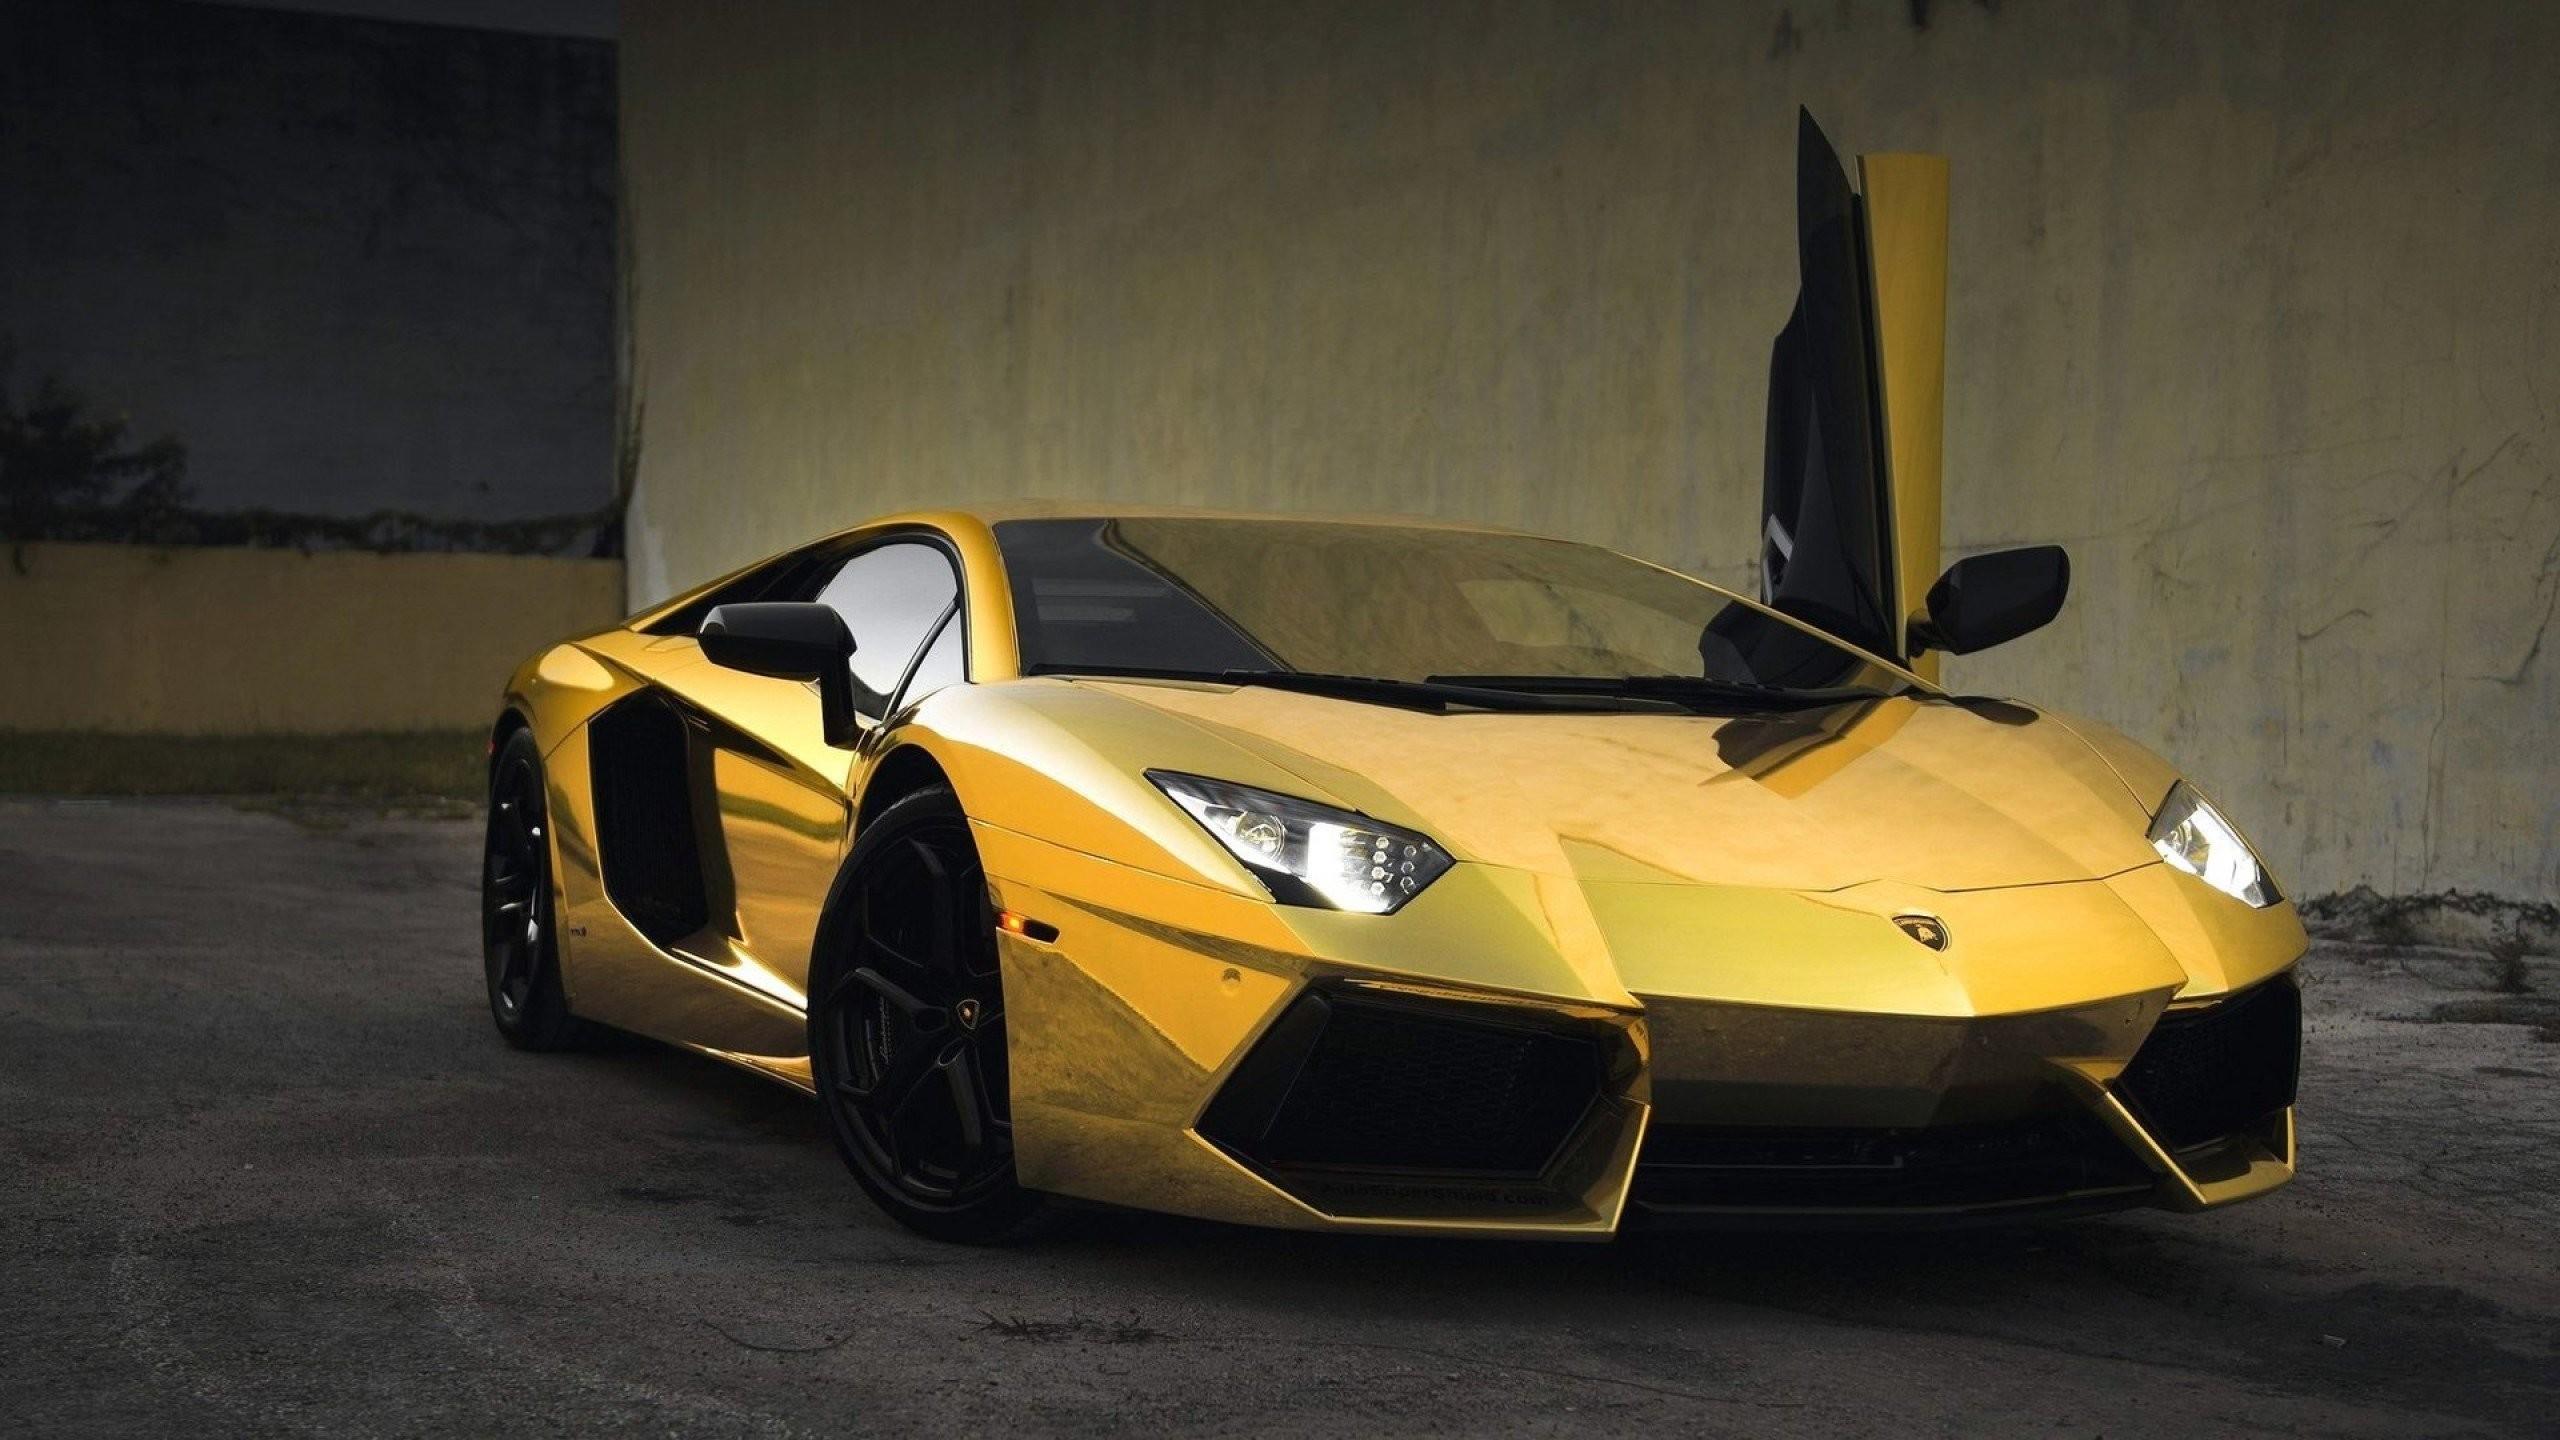 Gold Lamborghini Wallpapers Hd Wallpaper Collections